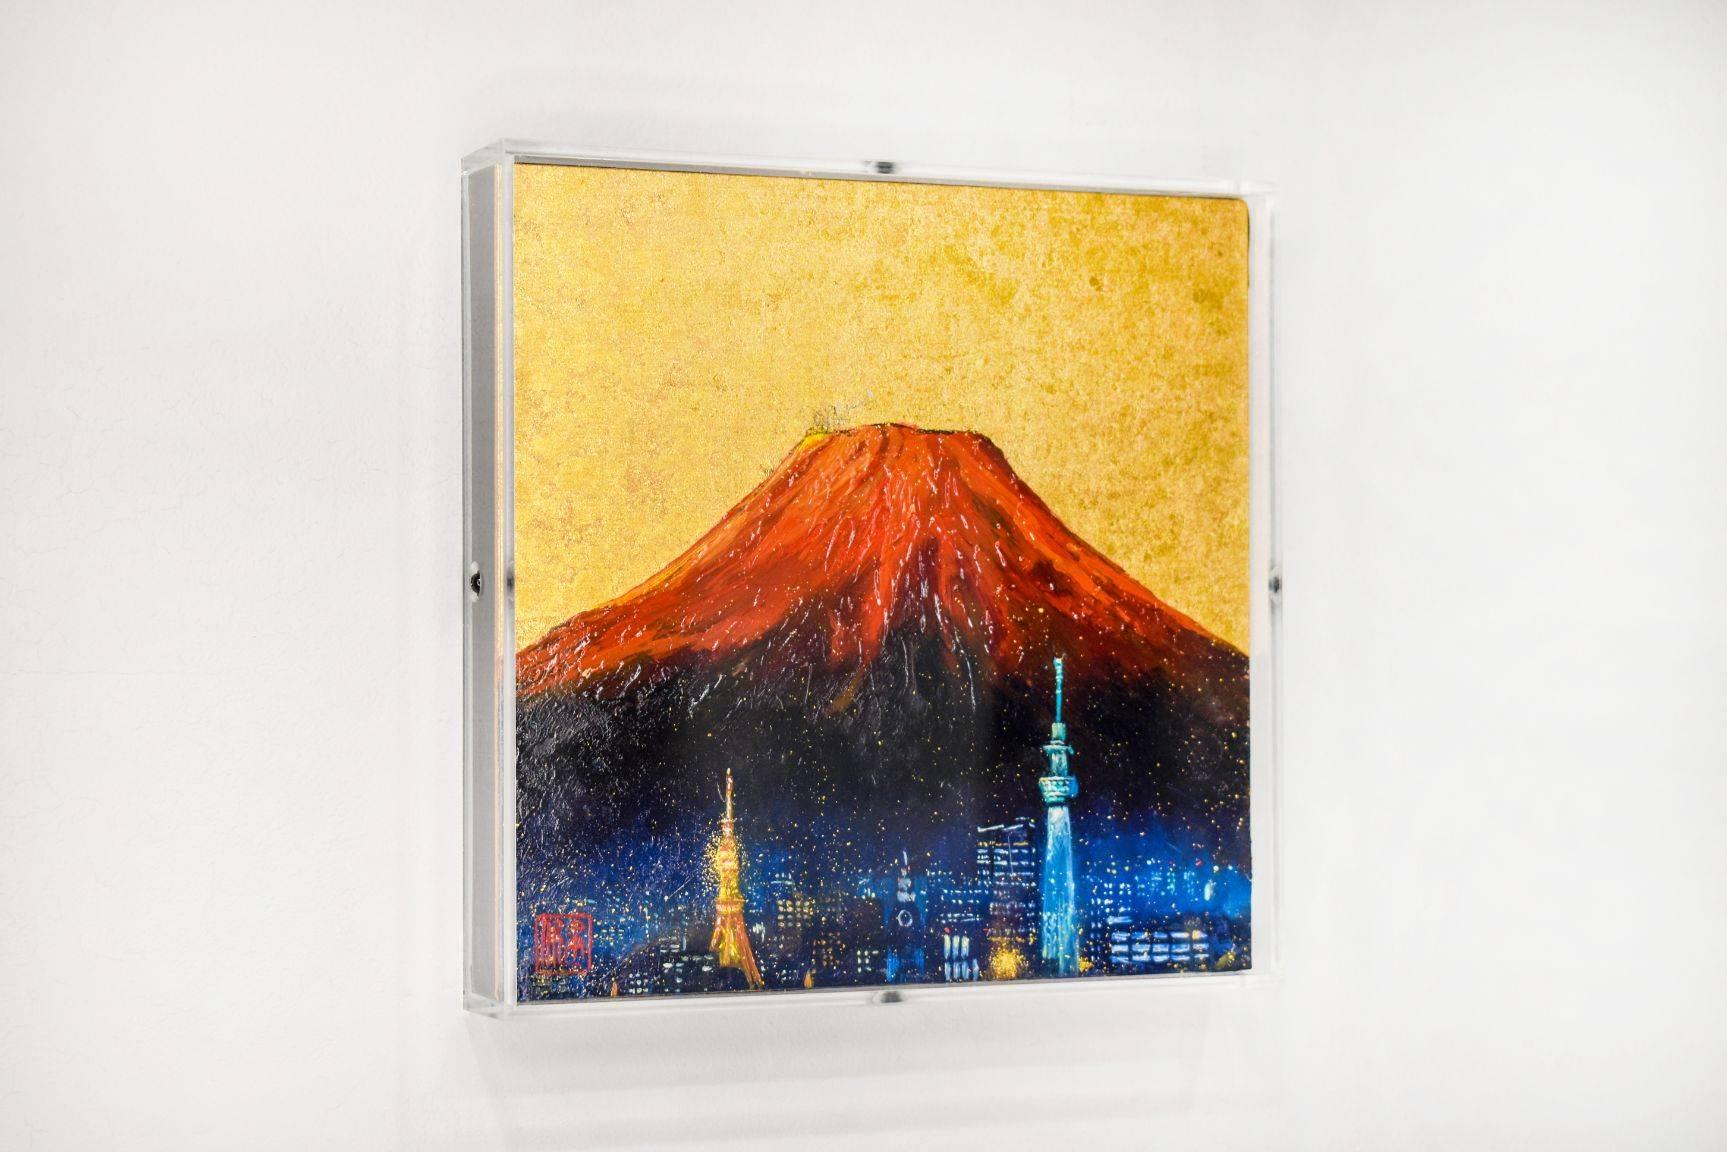 Gold Fuji